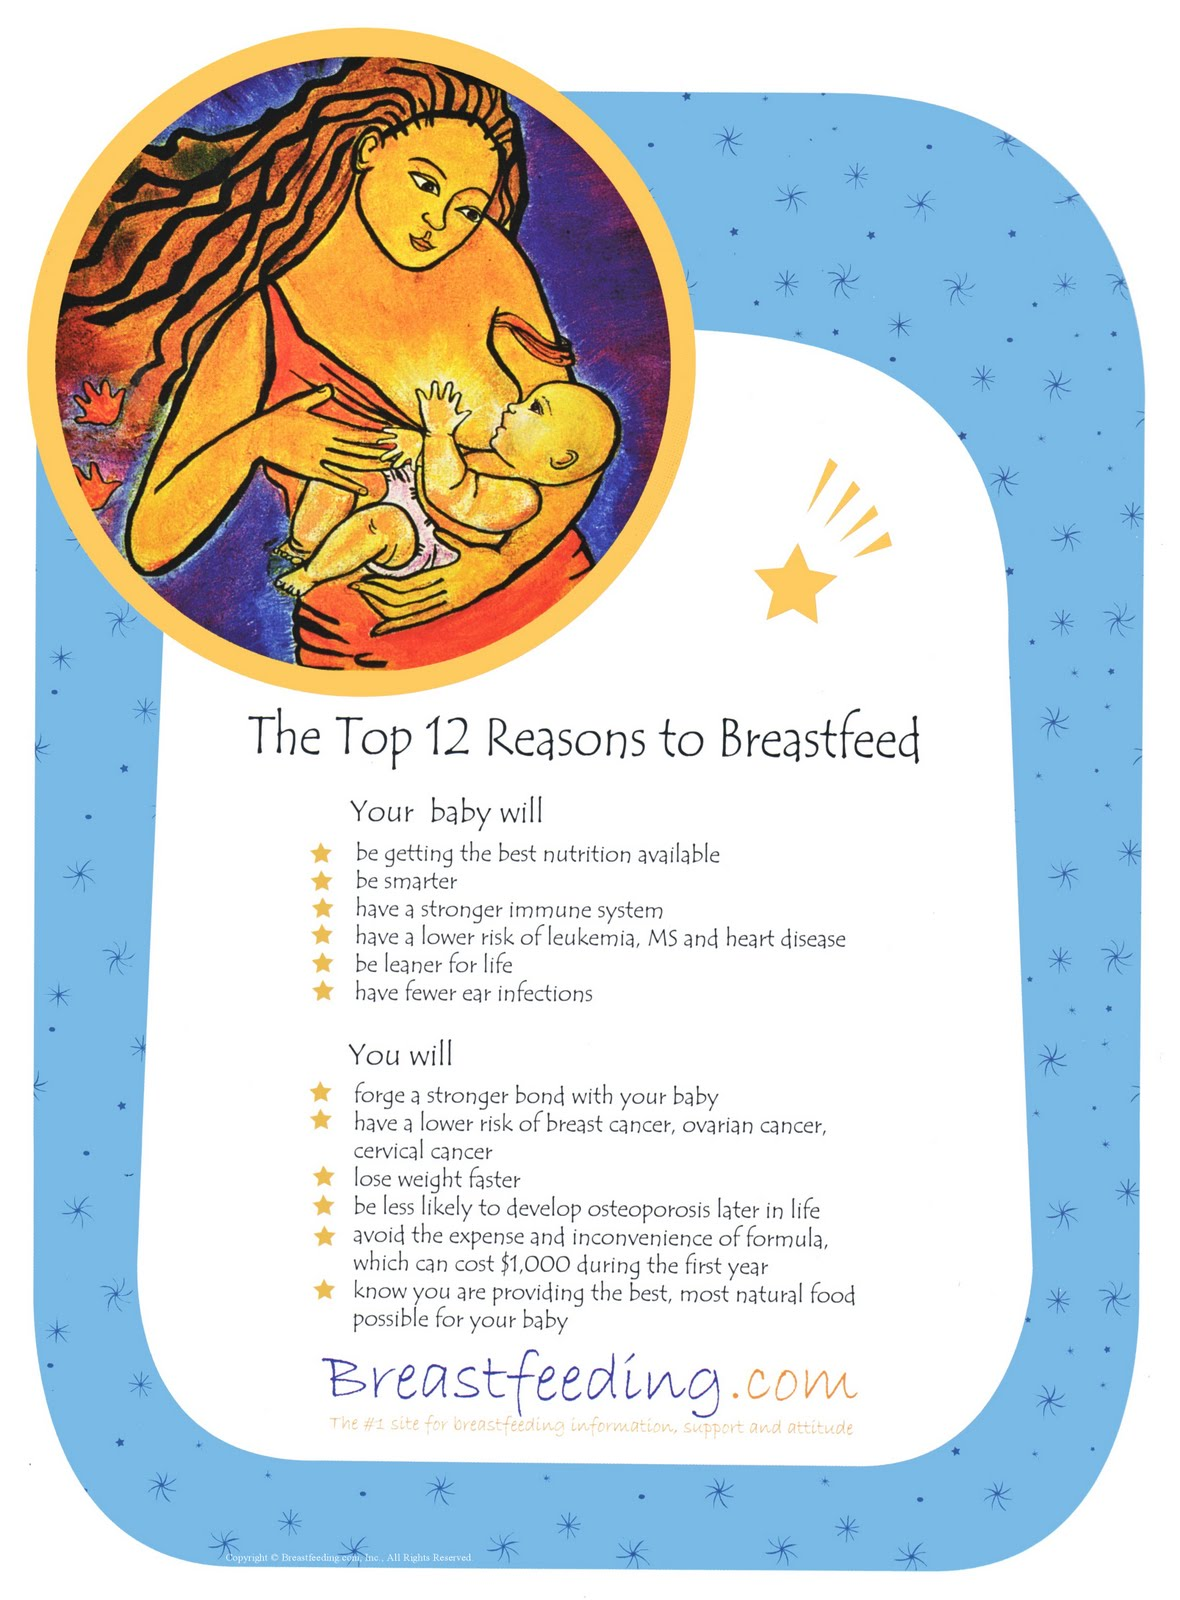 Breastfeeding is love reasons to breastfeed poster